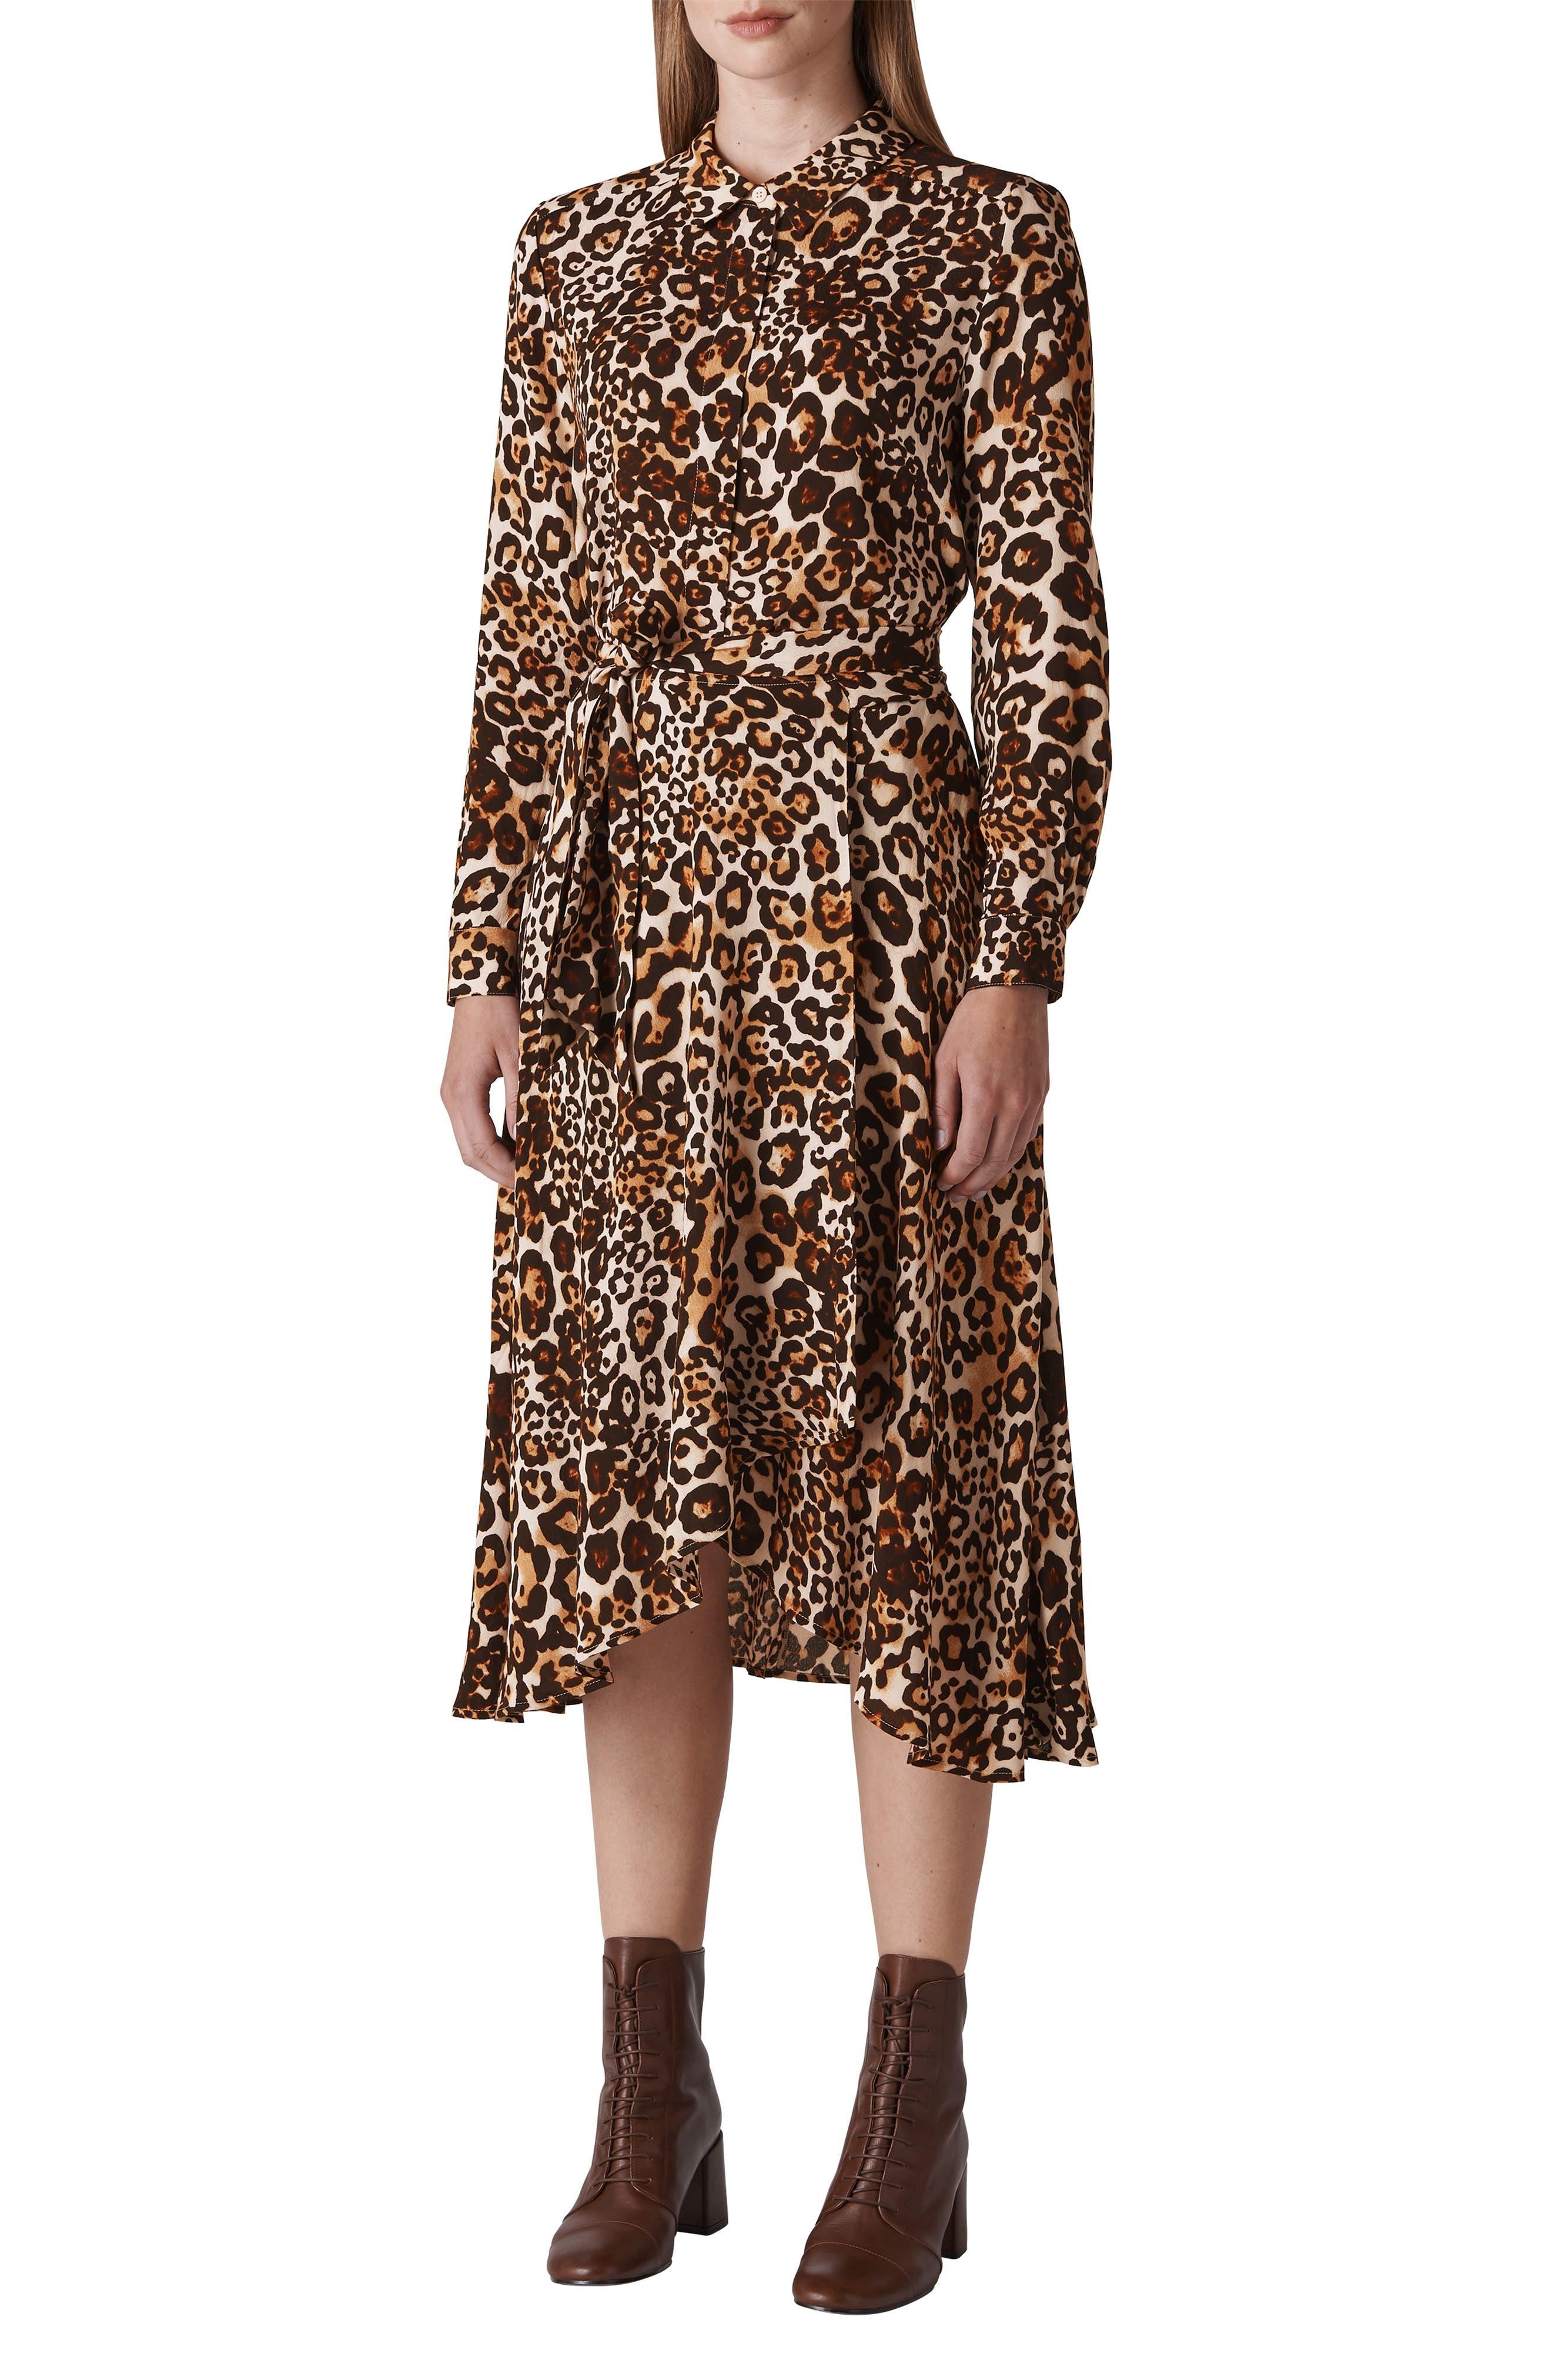 Esme Shirtdress,                         Main,                         color, LEOPARD PRINT